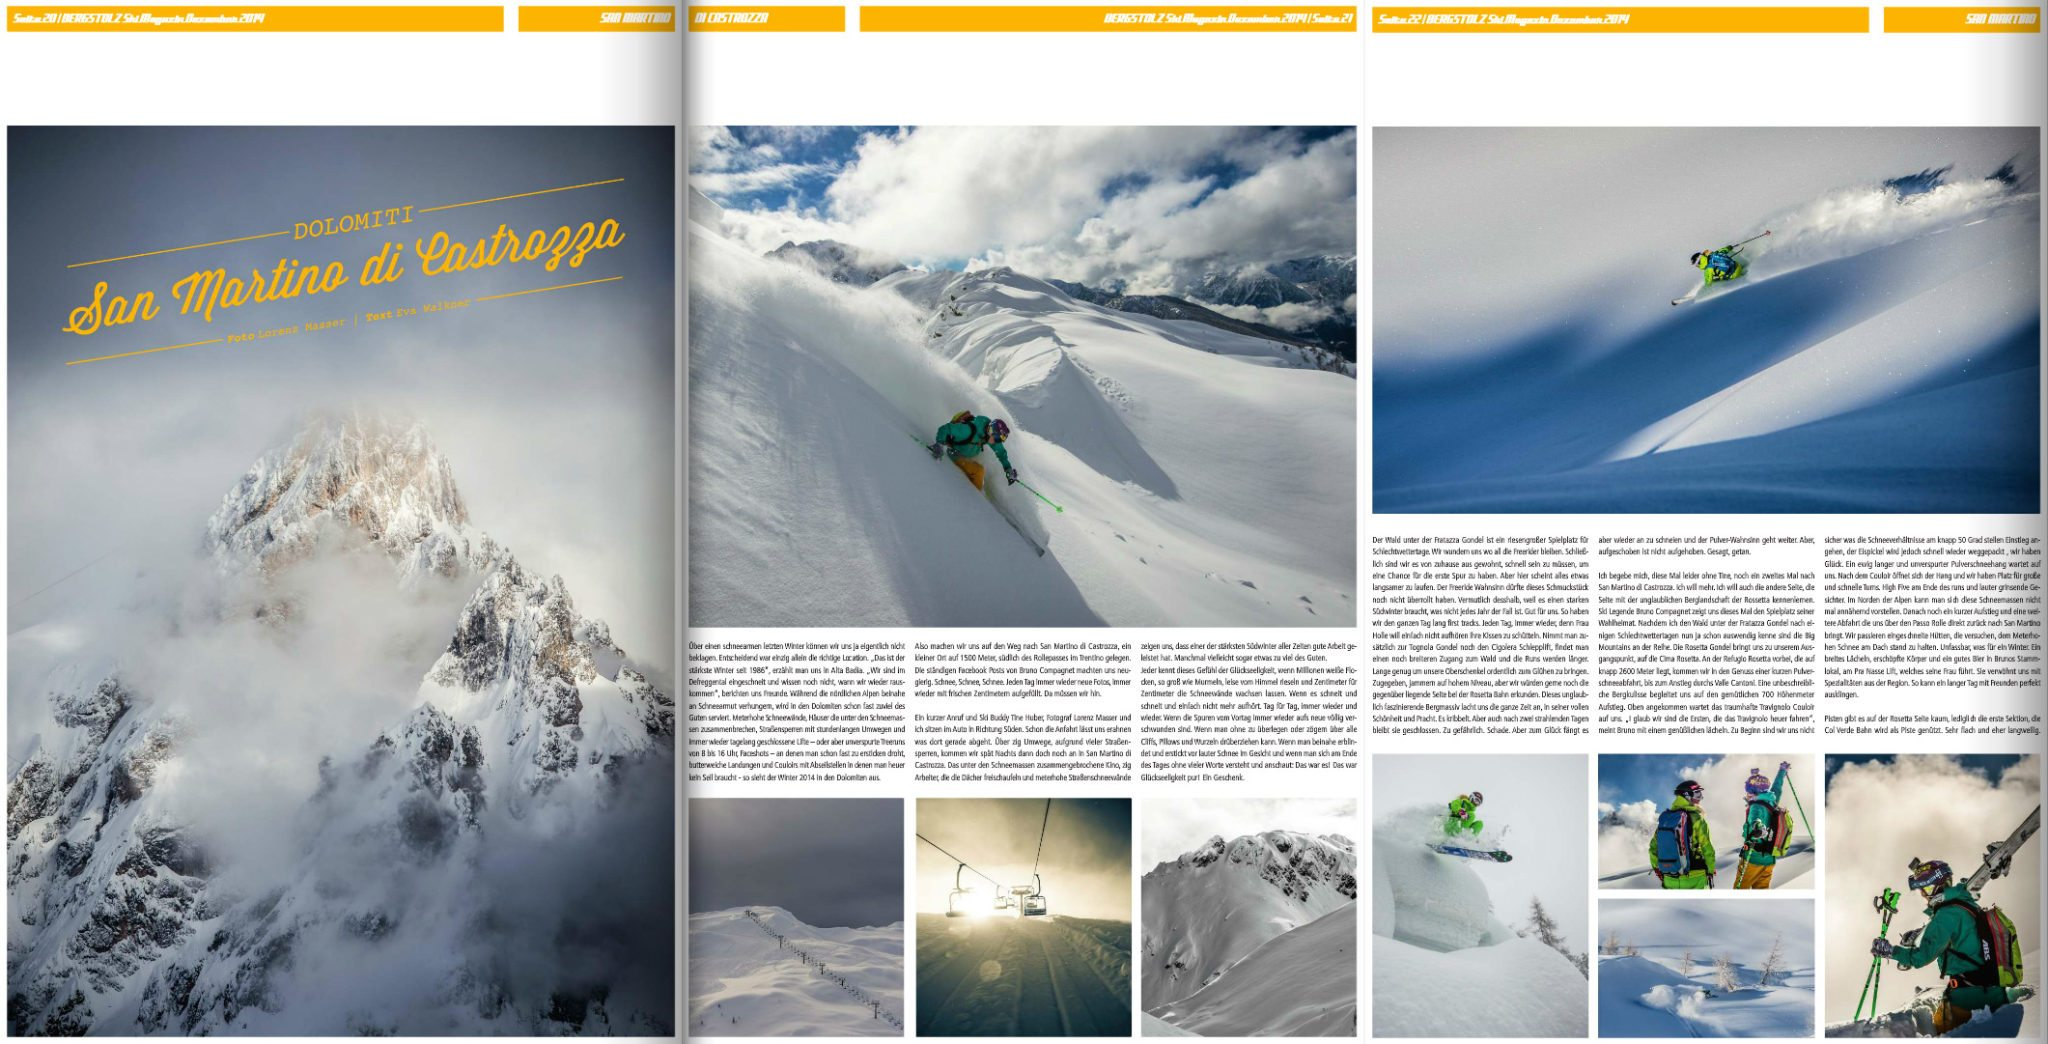 Bergstolz, San Martino, Zeitungsartikel, Fotograf Land Salzburg, Lorenz Masser